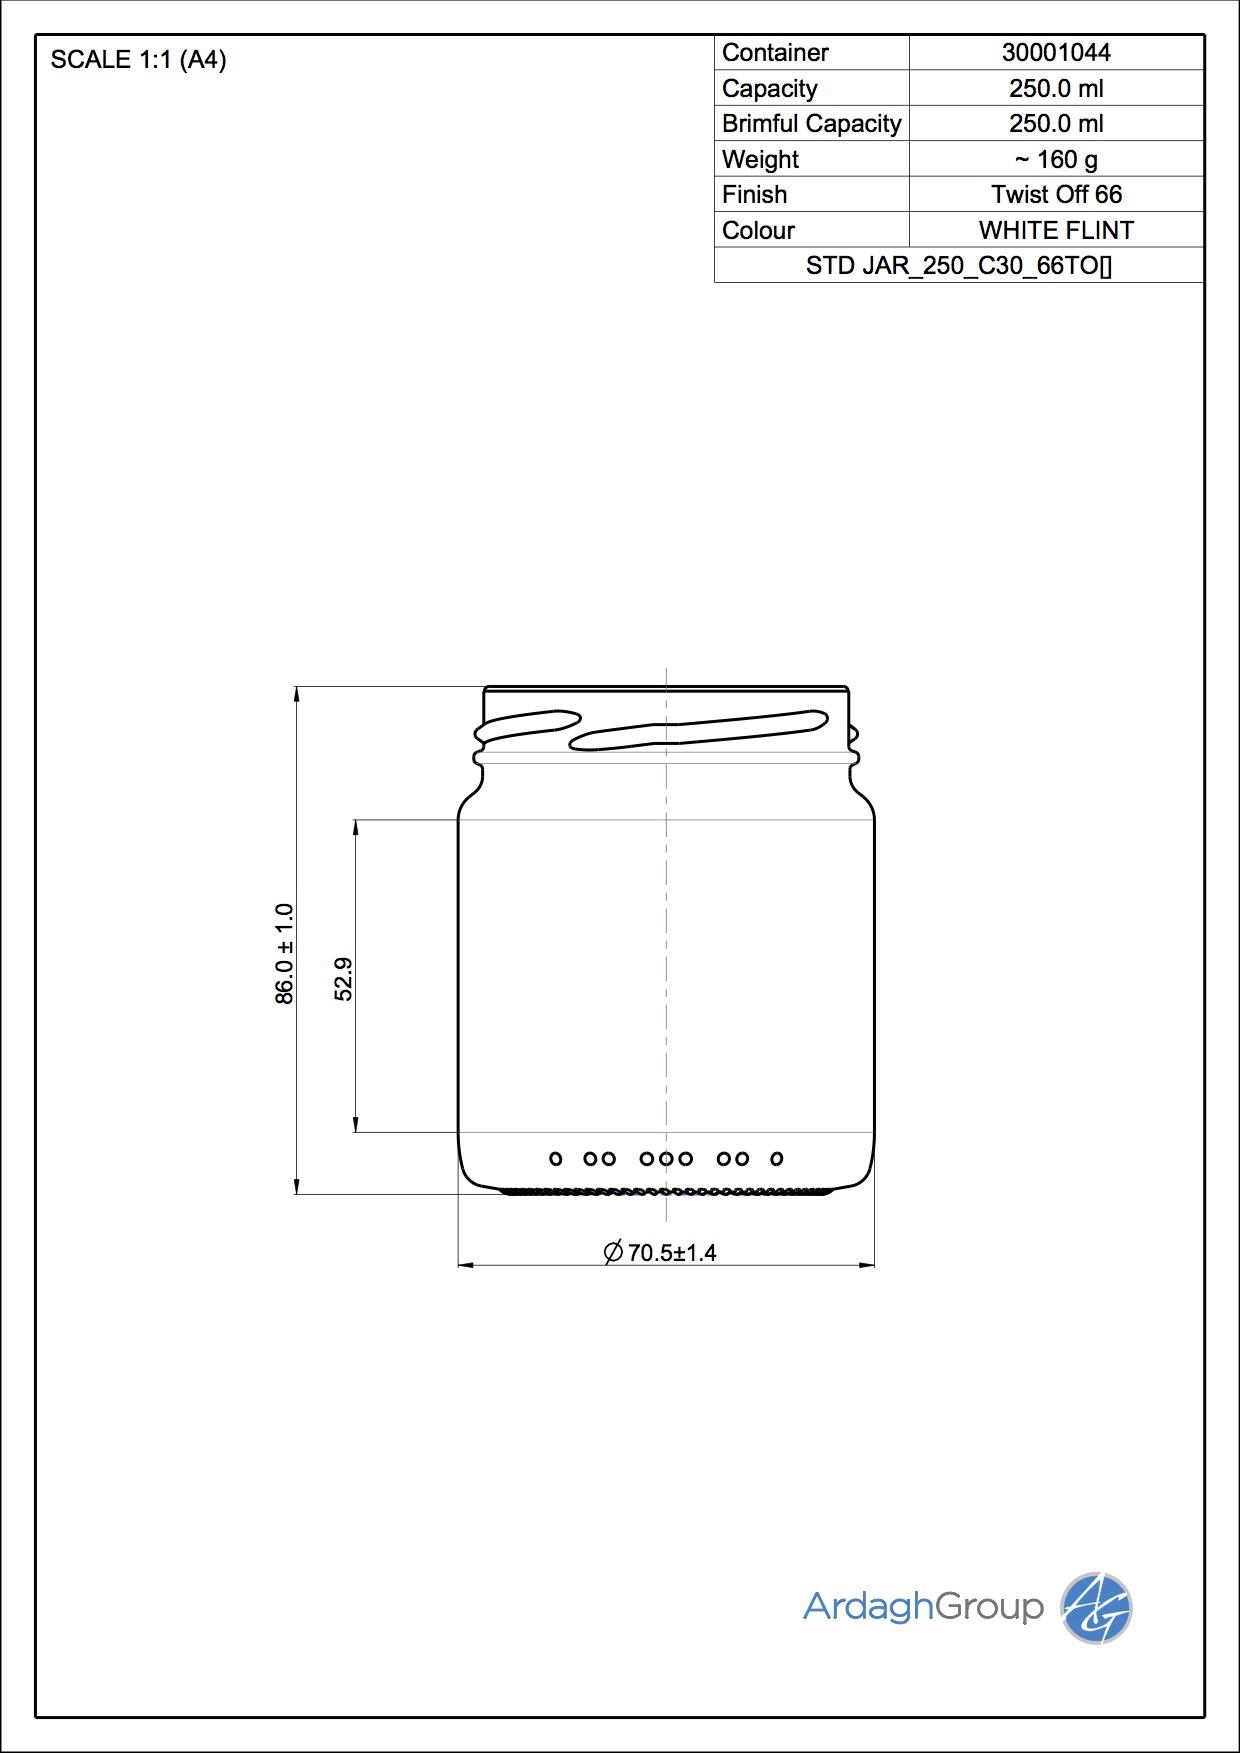 STD JAR 250 C30 66TO